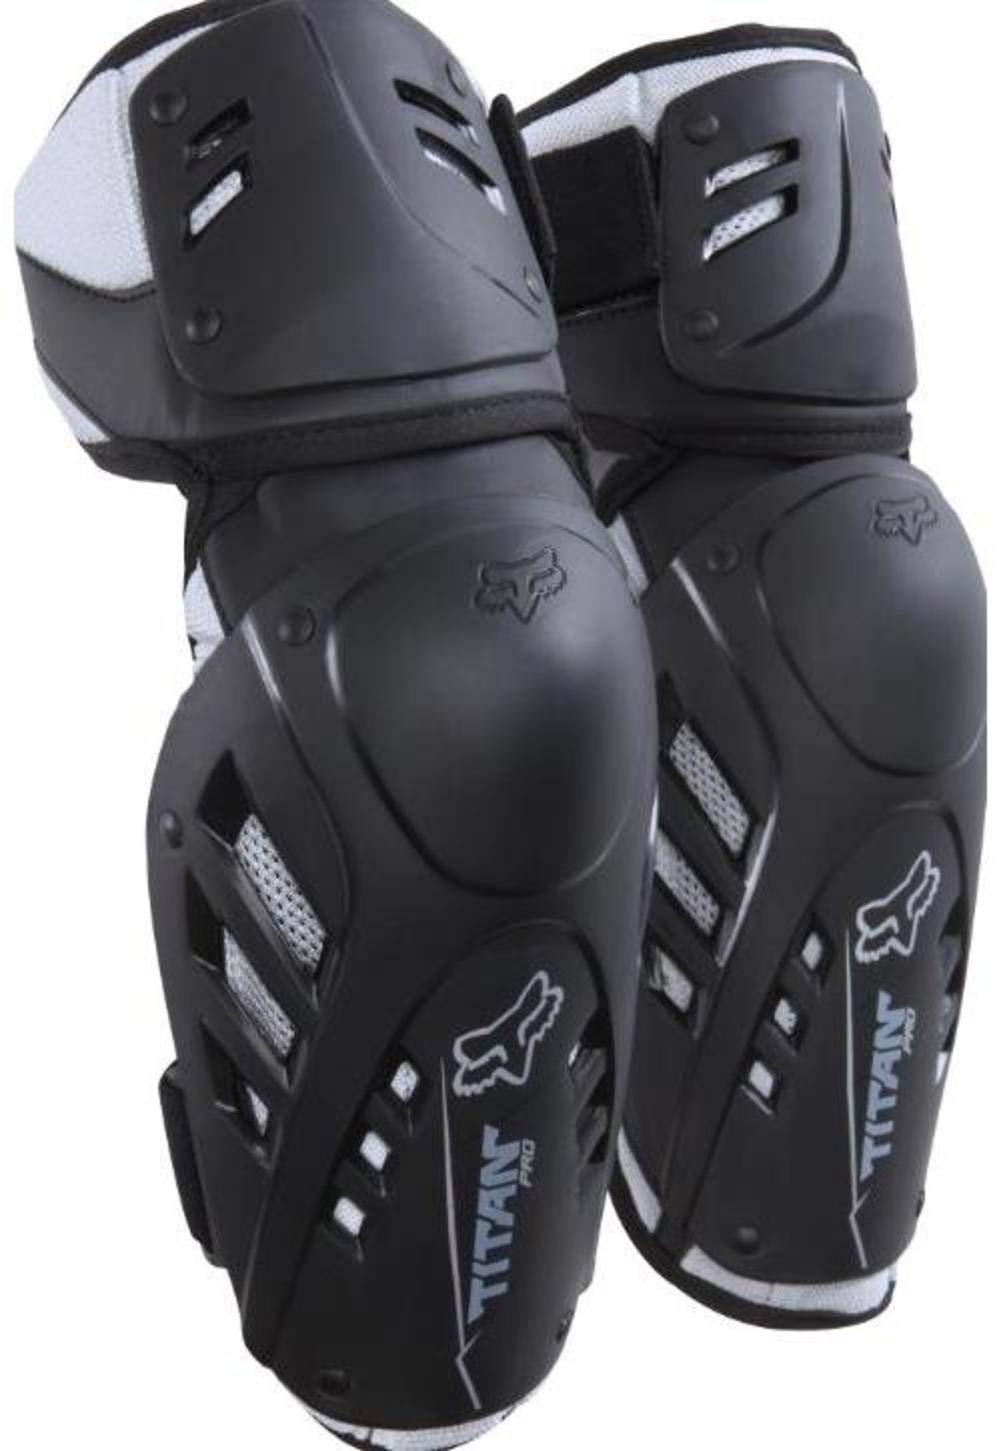 Fox Racing Titan Pro Adult Elbow Guard MotoX Motorcycle Body Armor - Black / Large/X-Large 03009